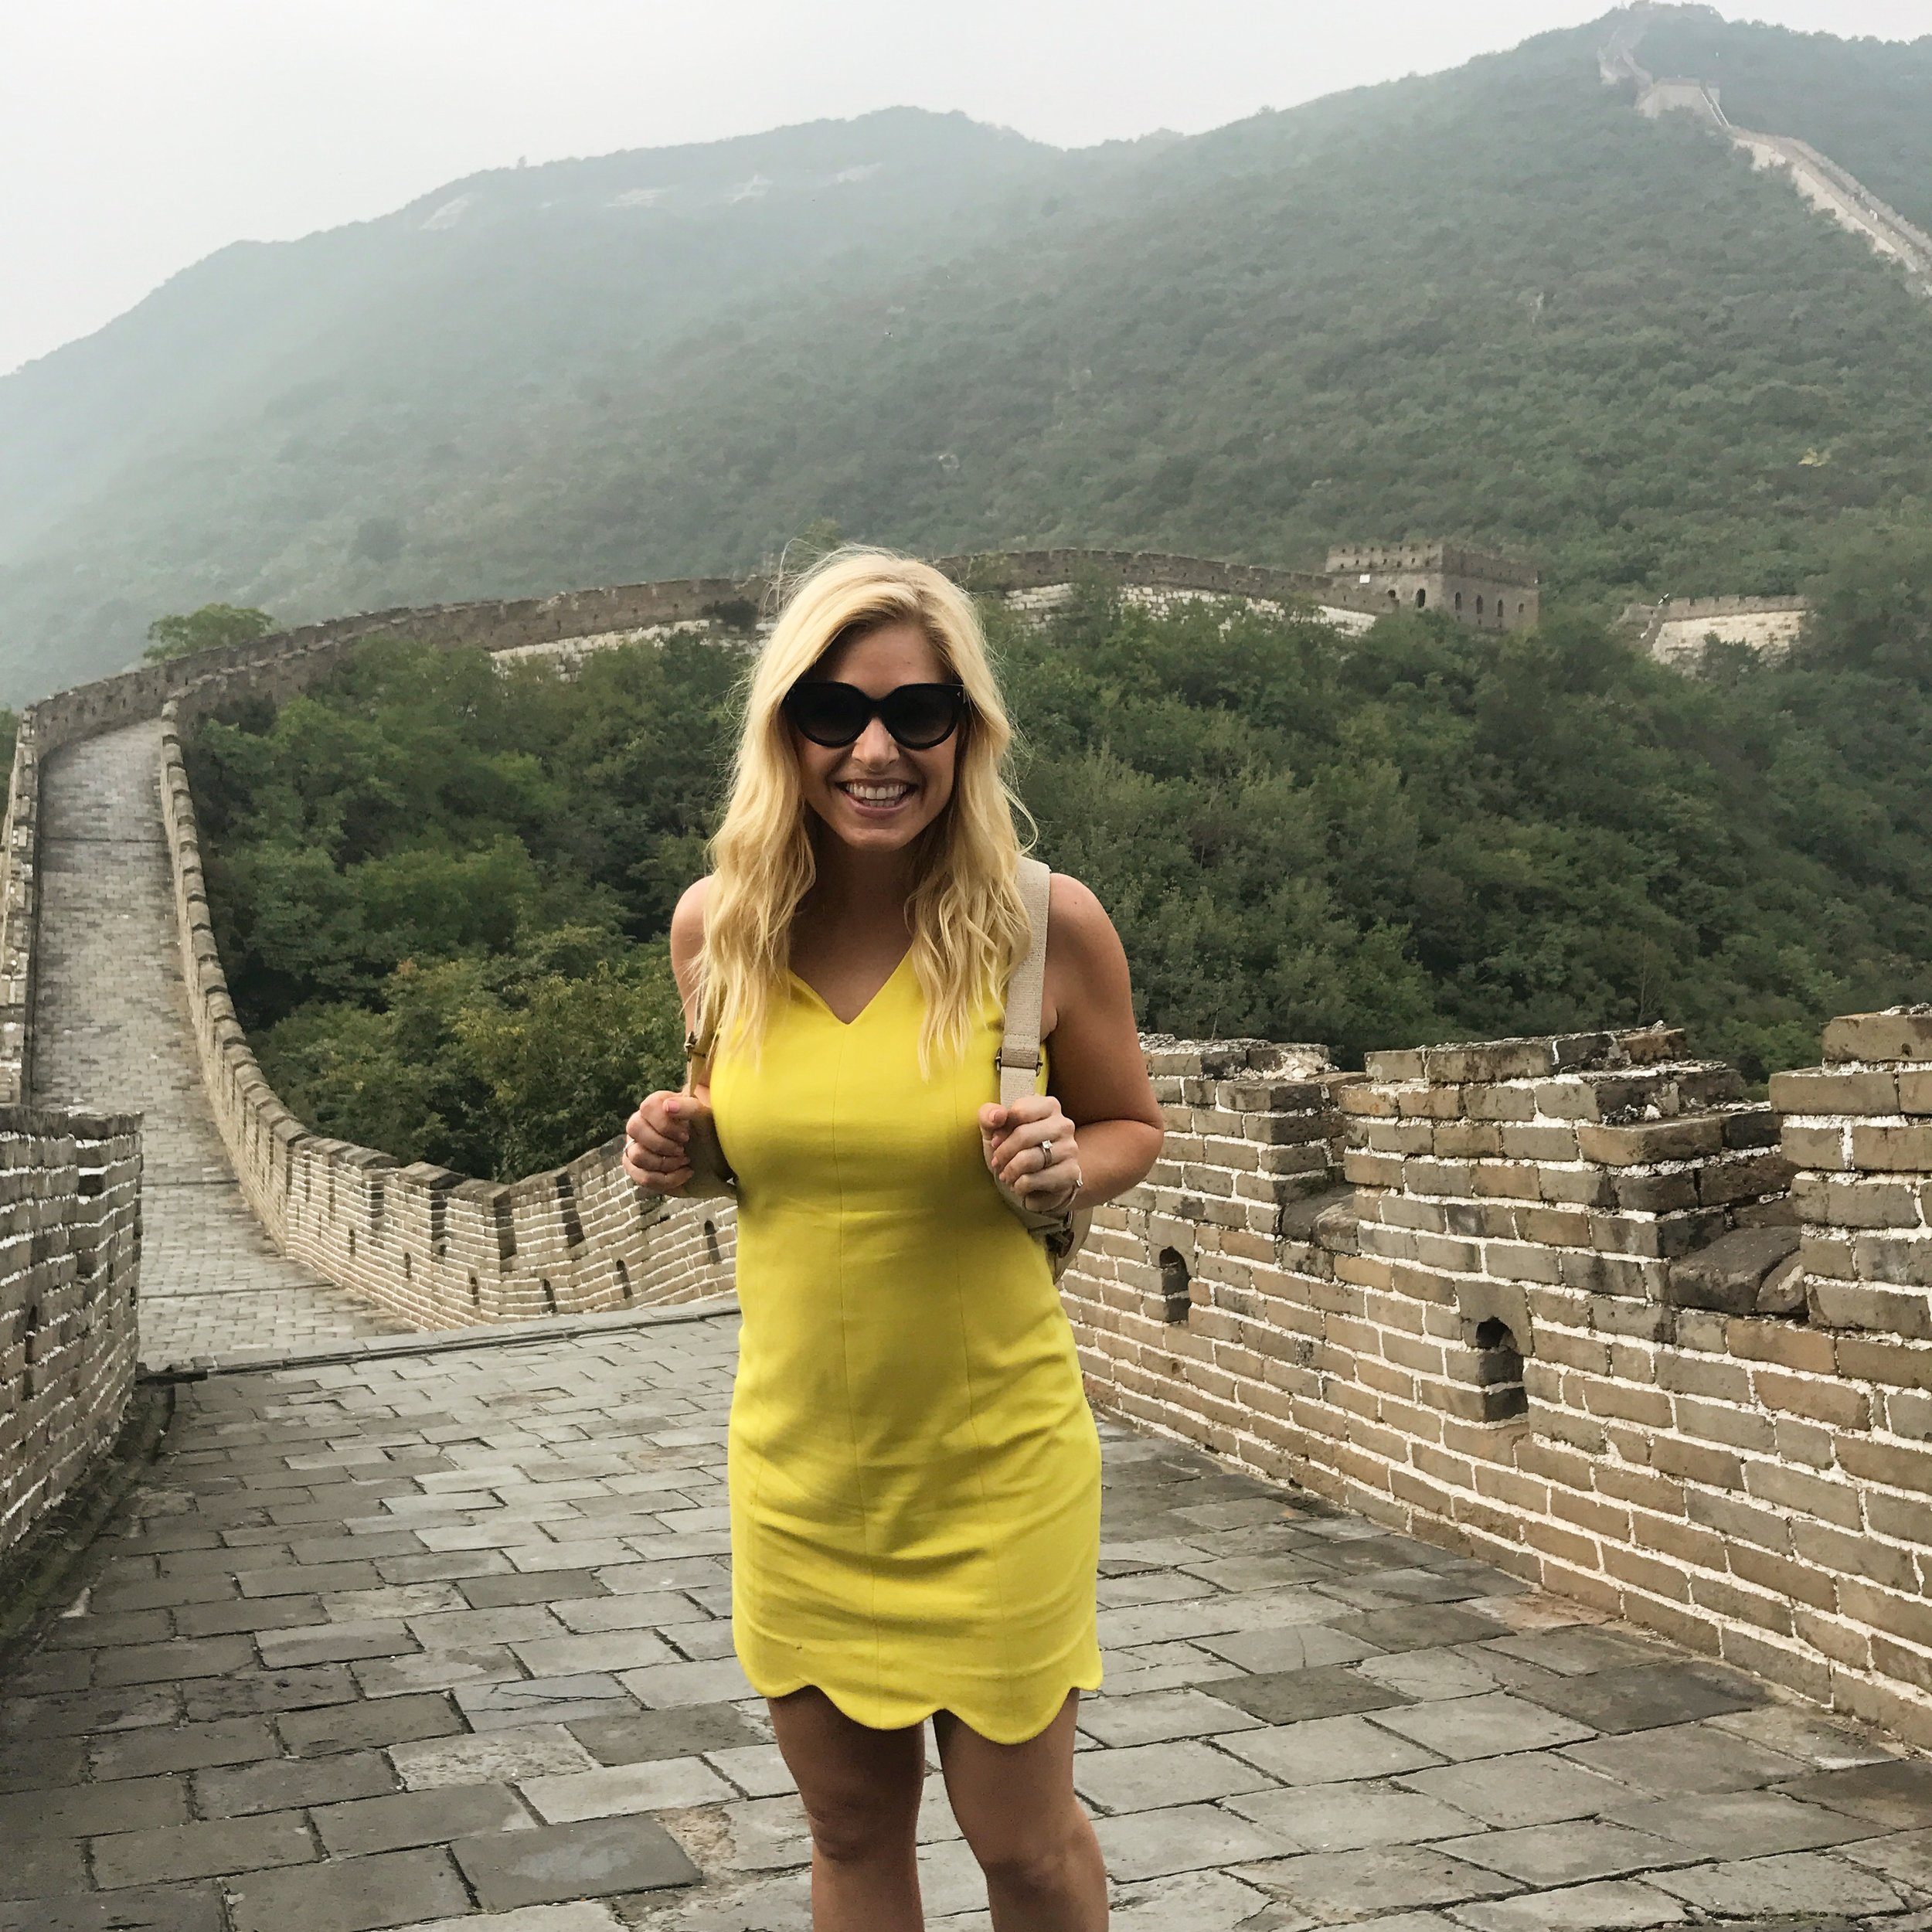 Anna Kooiman annakooiman.com beijing fitness travel lifestyle fashion adventure television china intercontinental